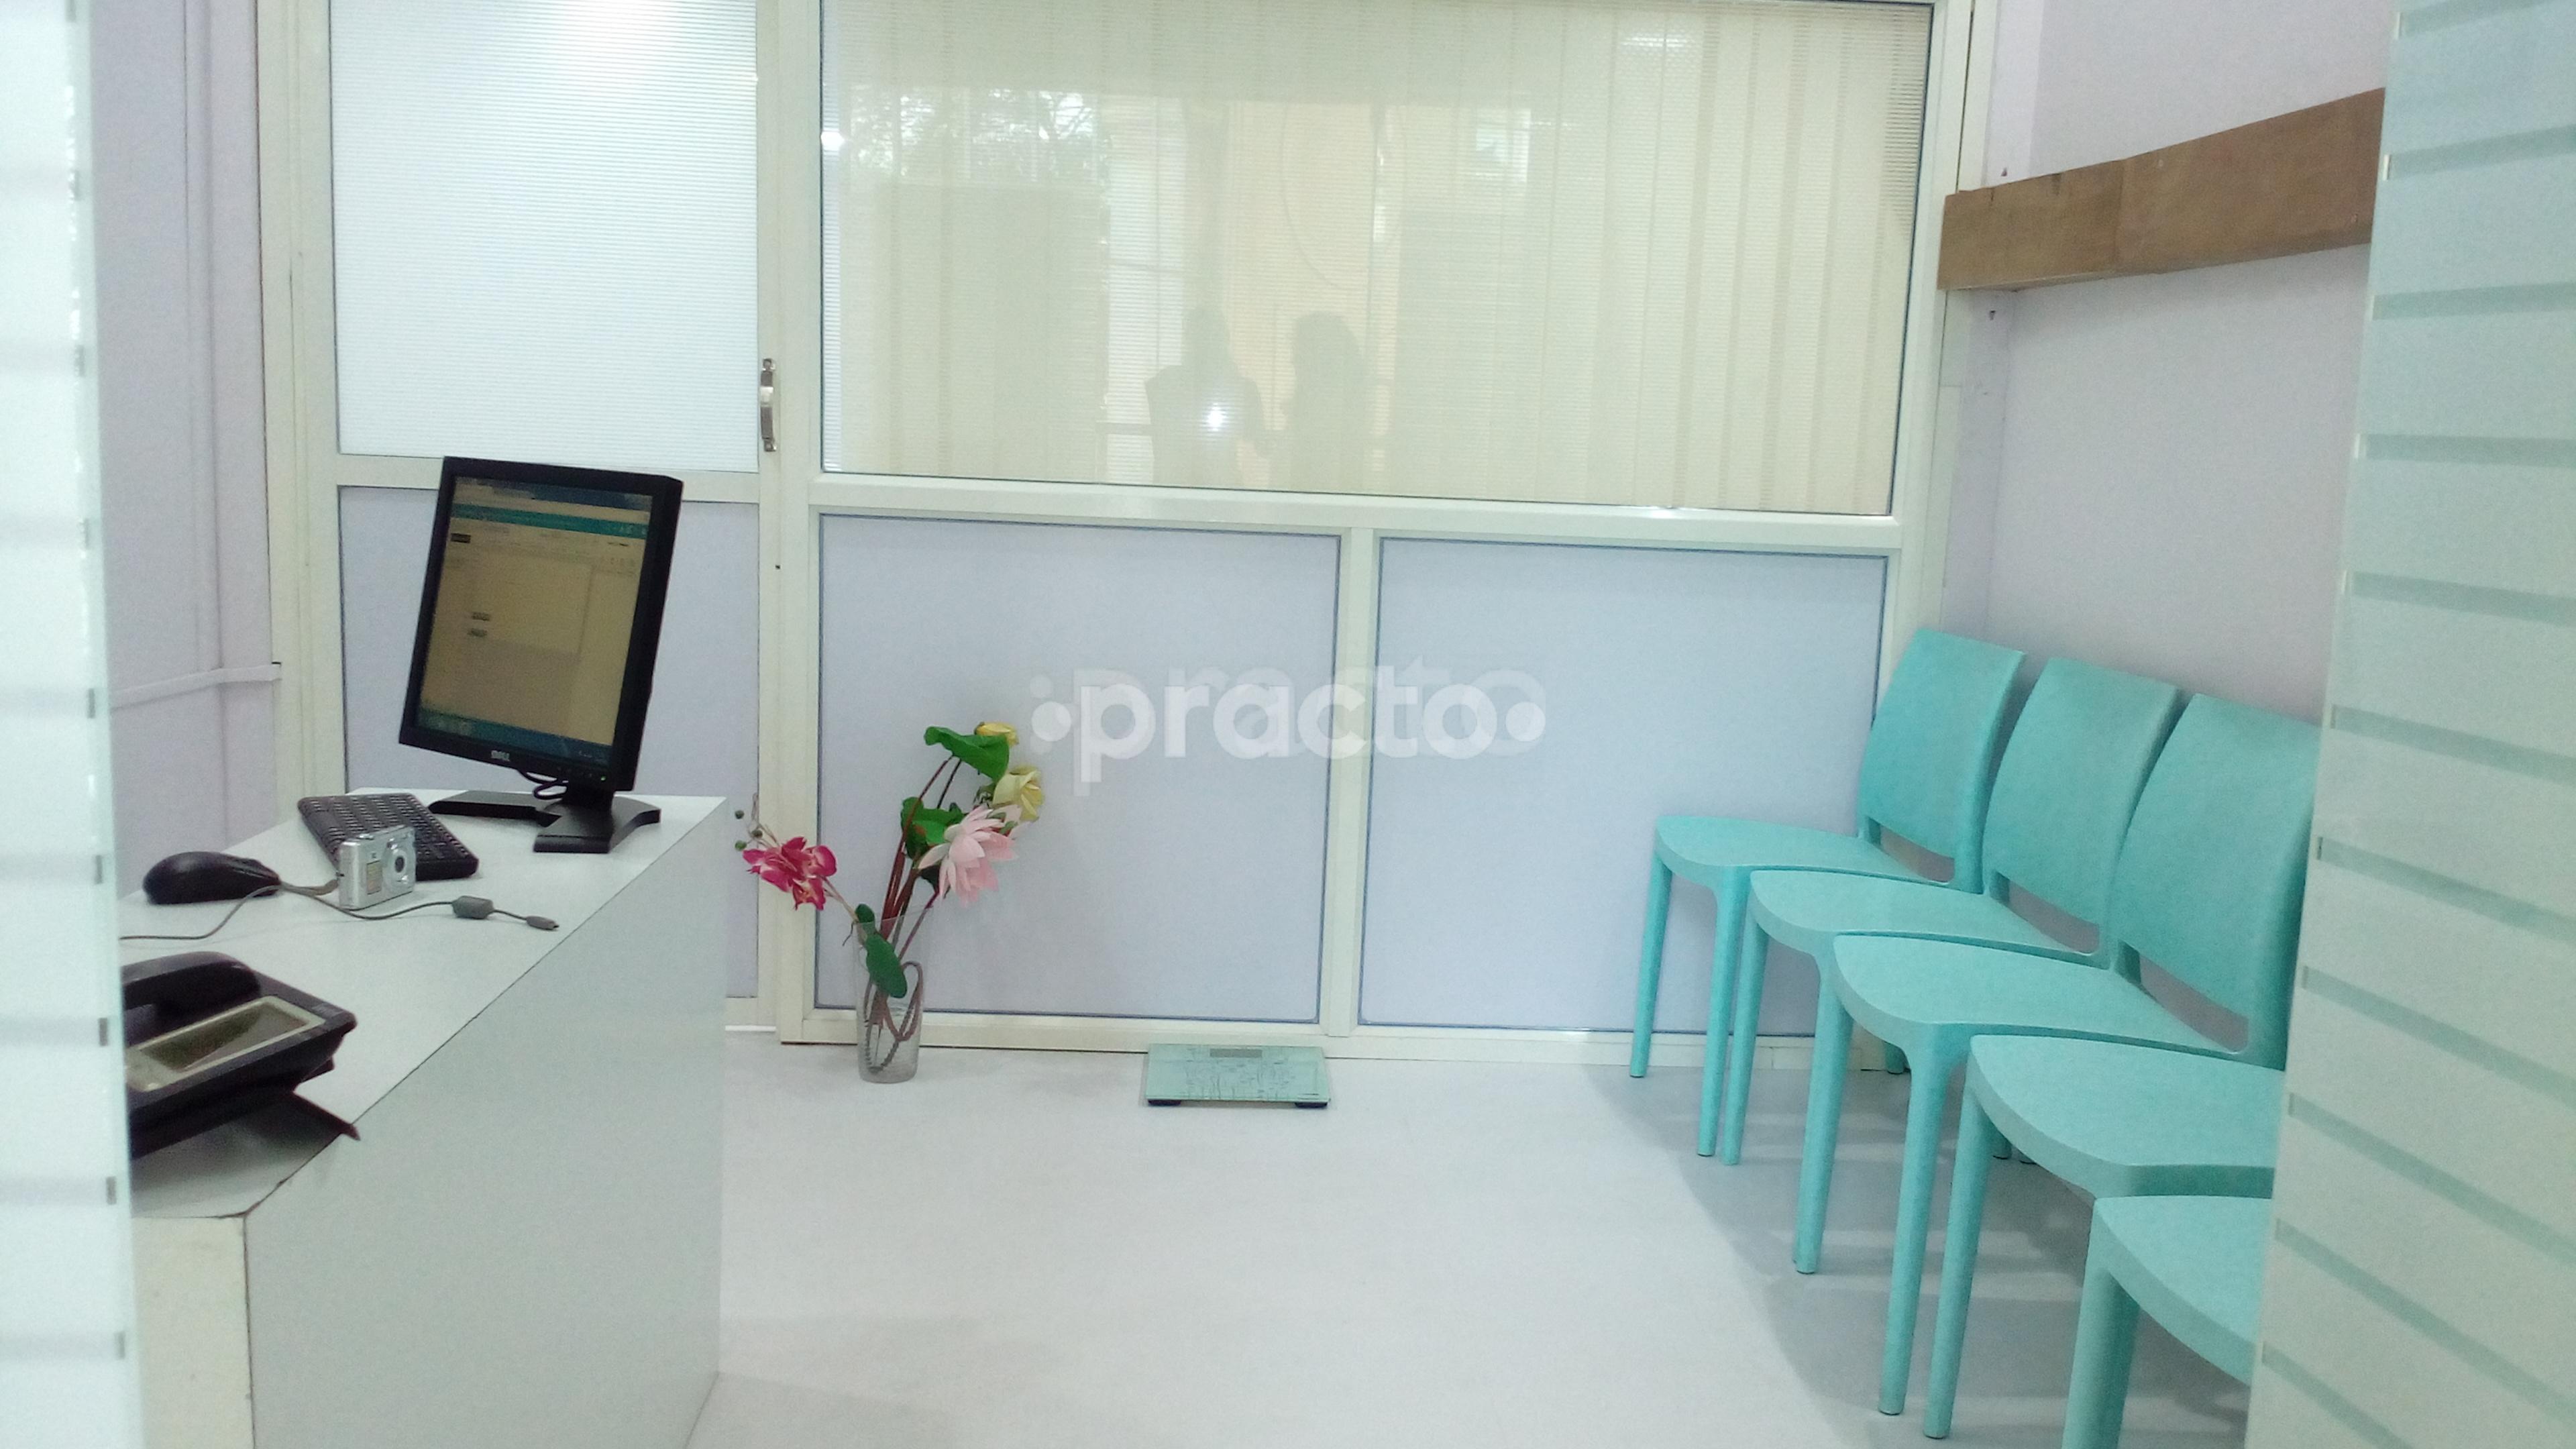 Dr  Ishani Chakravarty - Dermatologist - Book Appointment